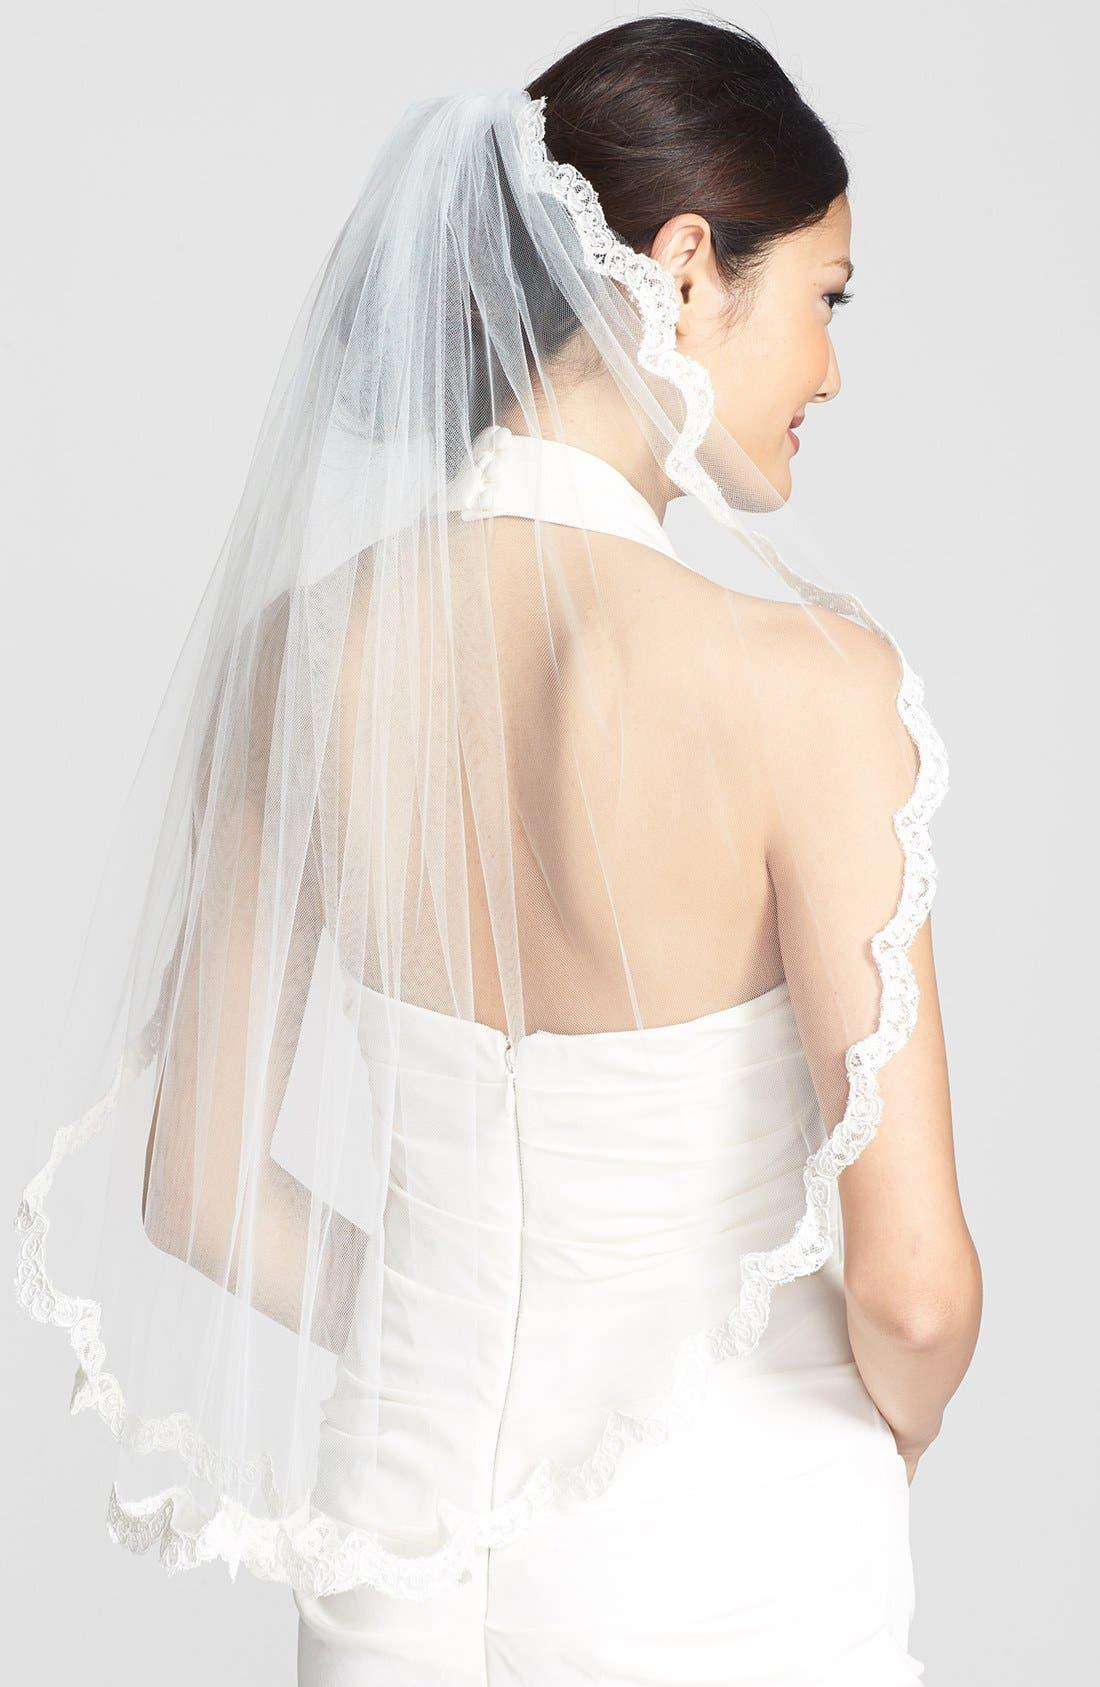 Alternate Image 1 Selected - Wedding Belles New York 'Lola' Lace Border Veil (Nordstrom Exclusive)